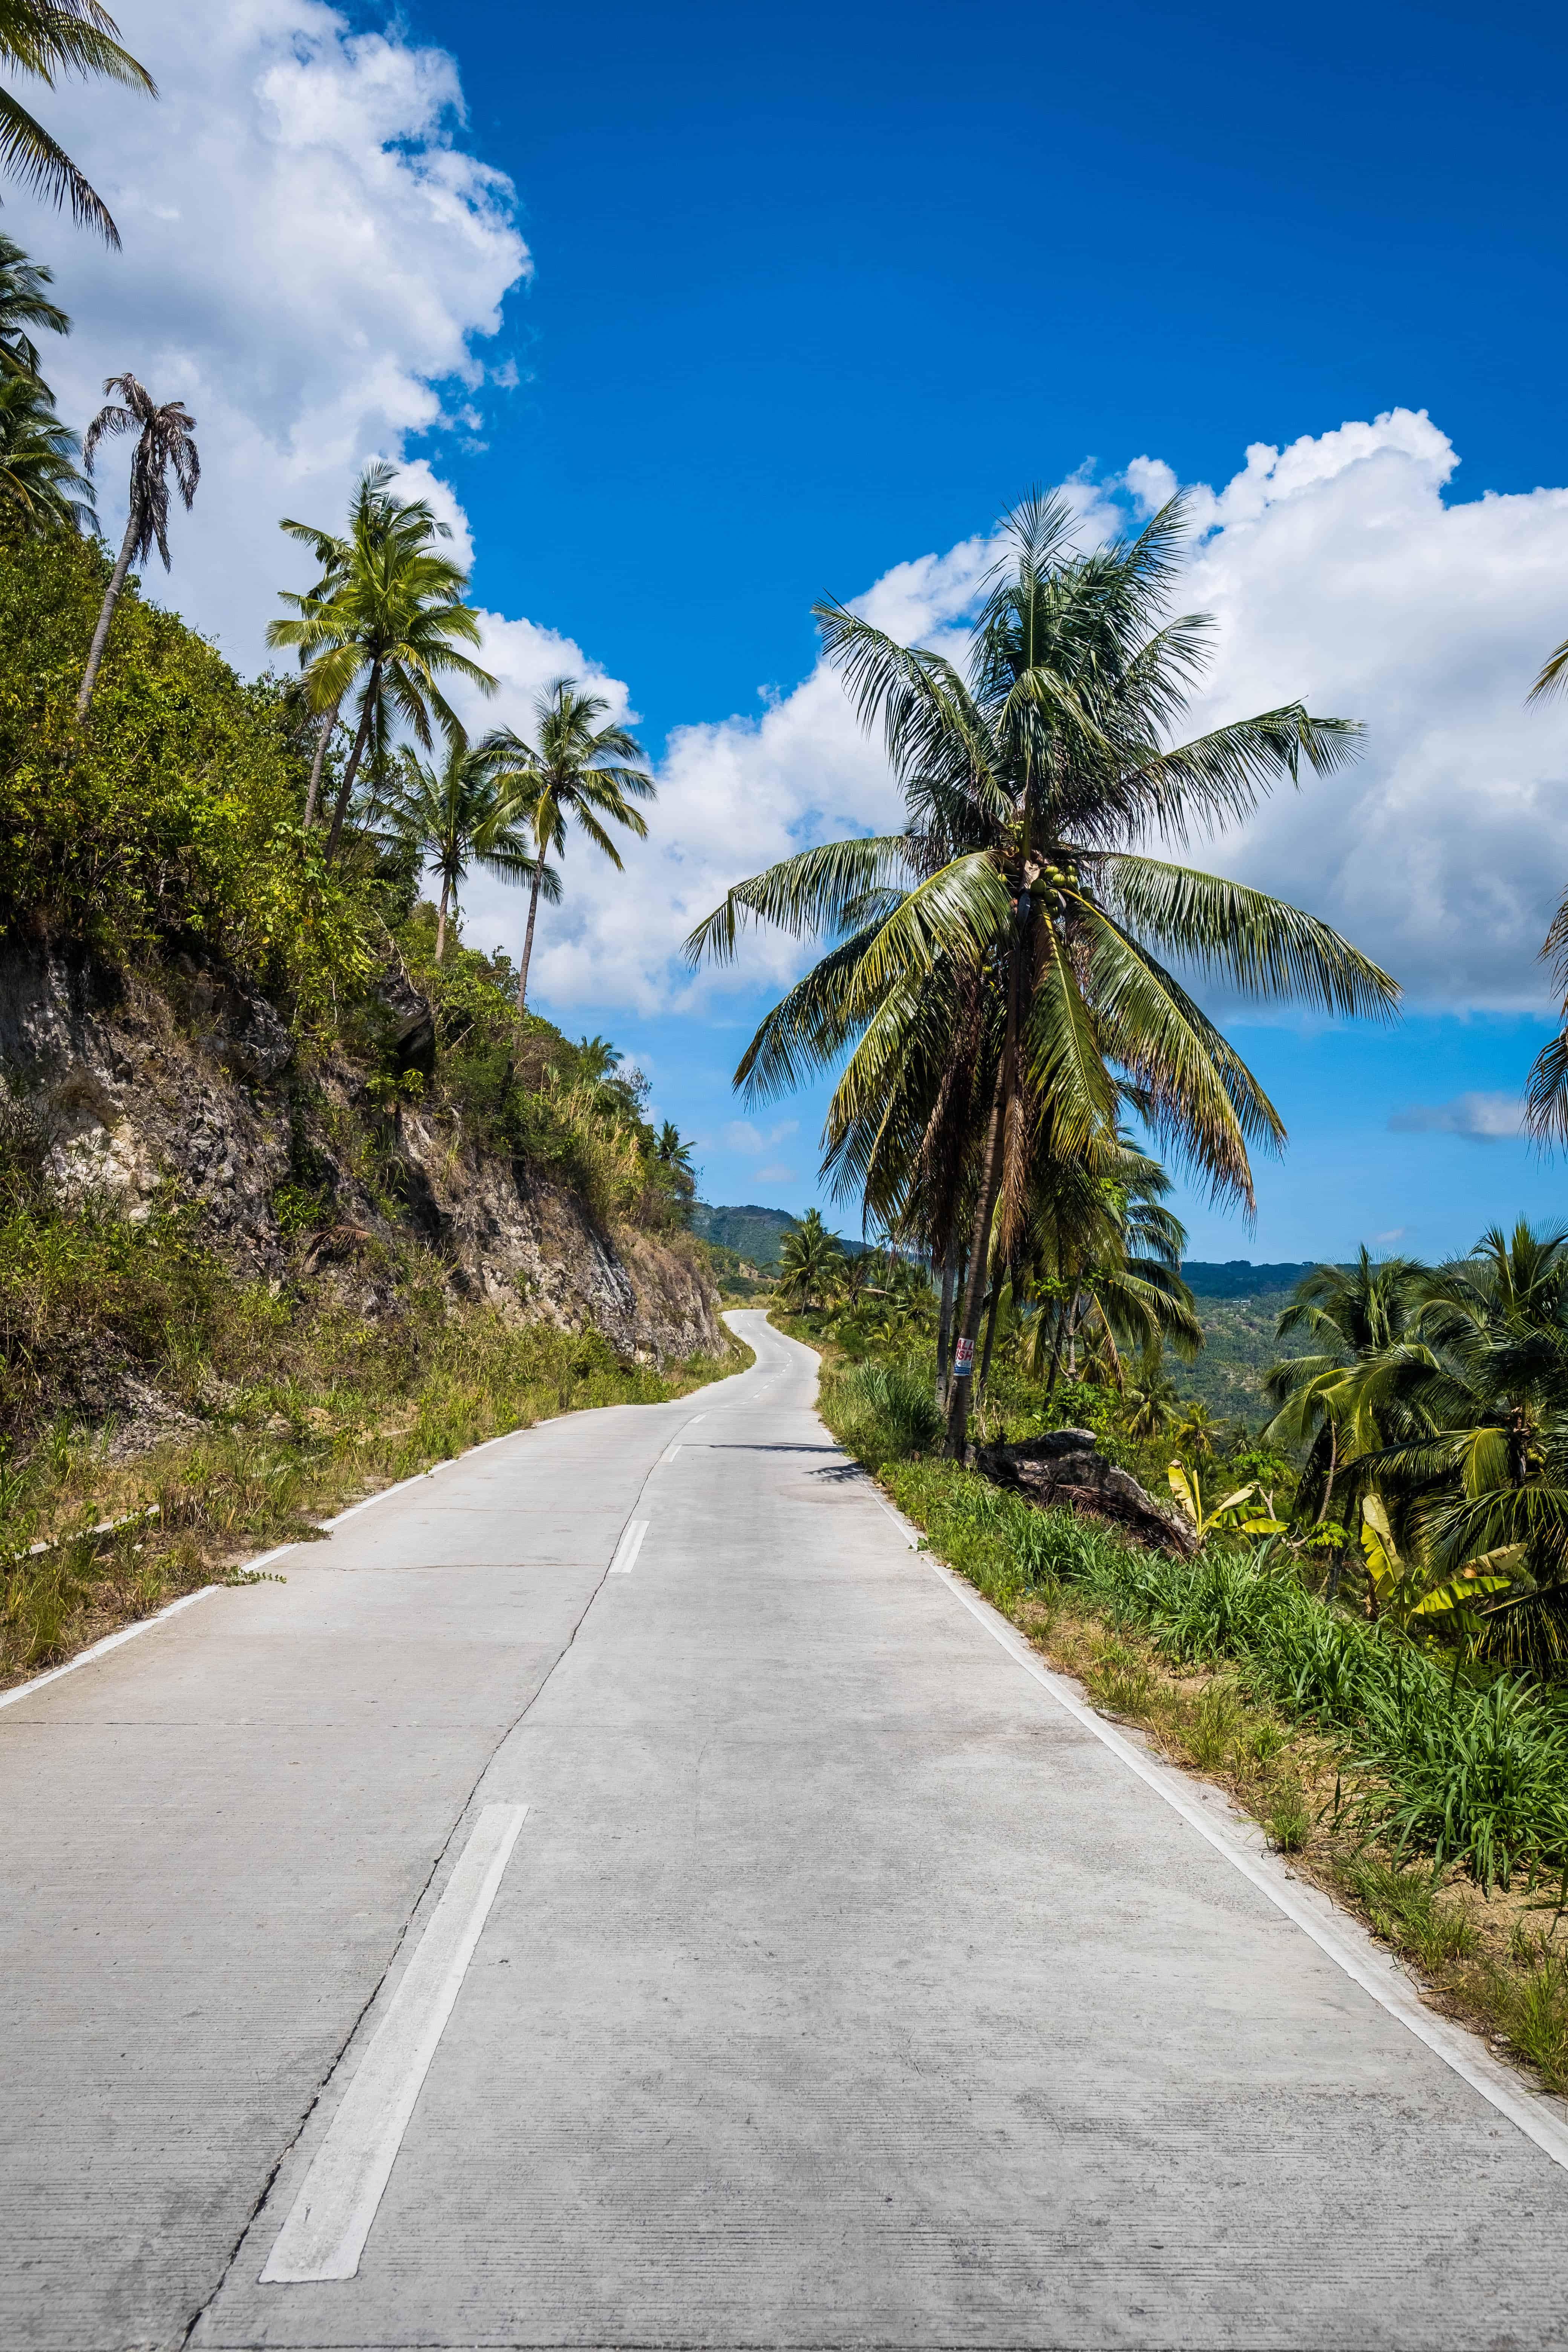 Things to do in Moalboal, Cebu